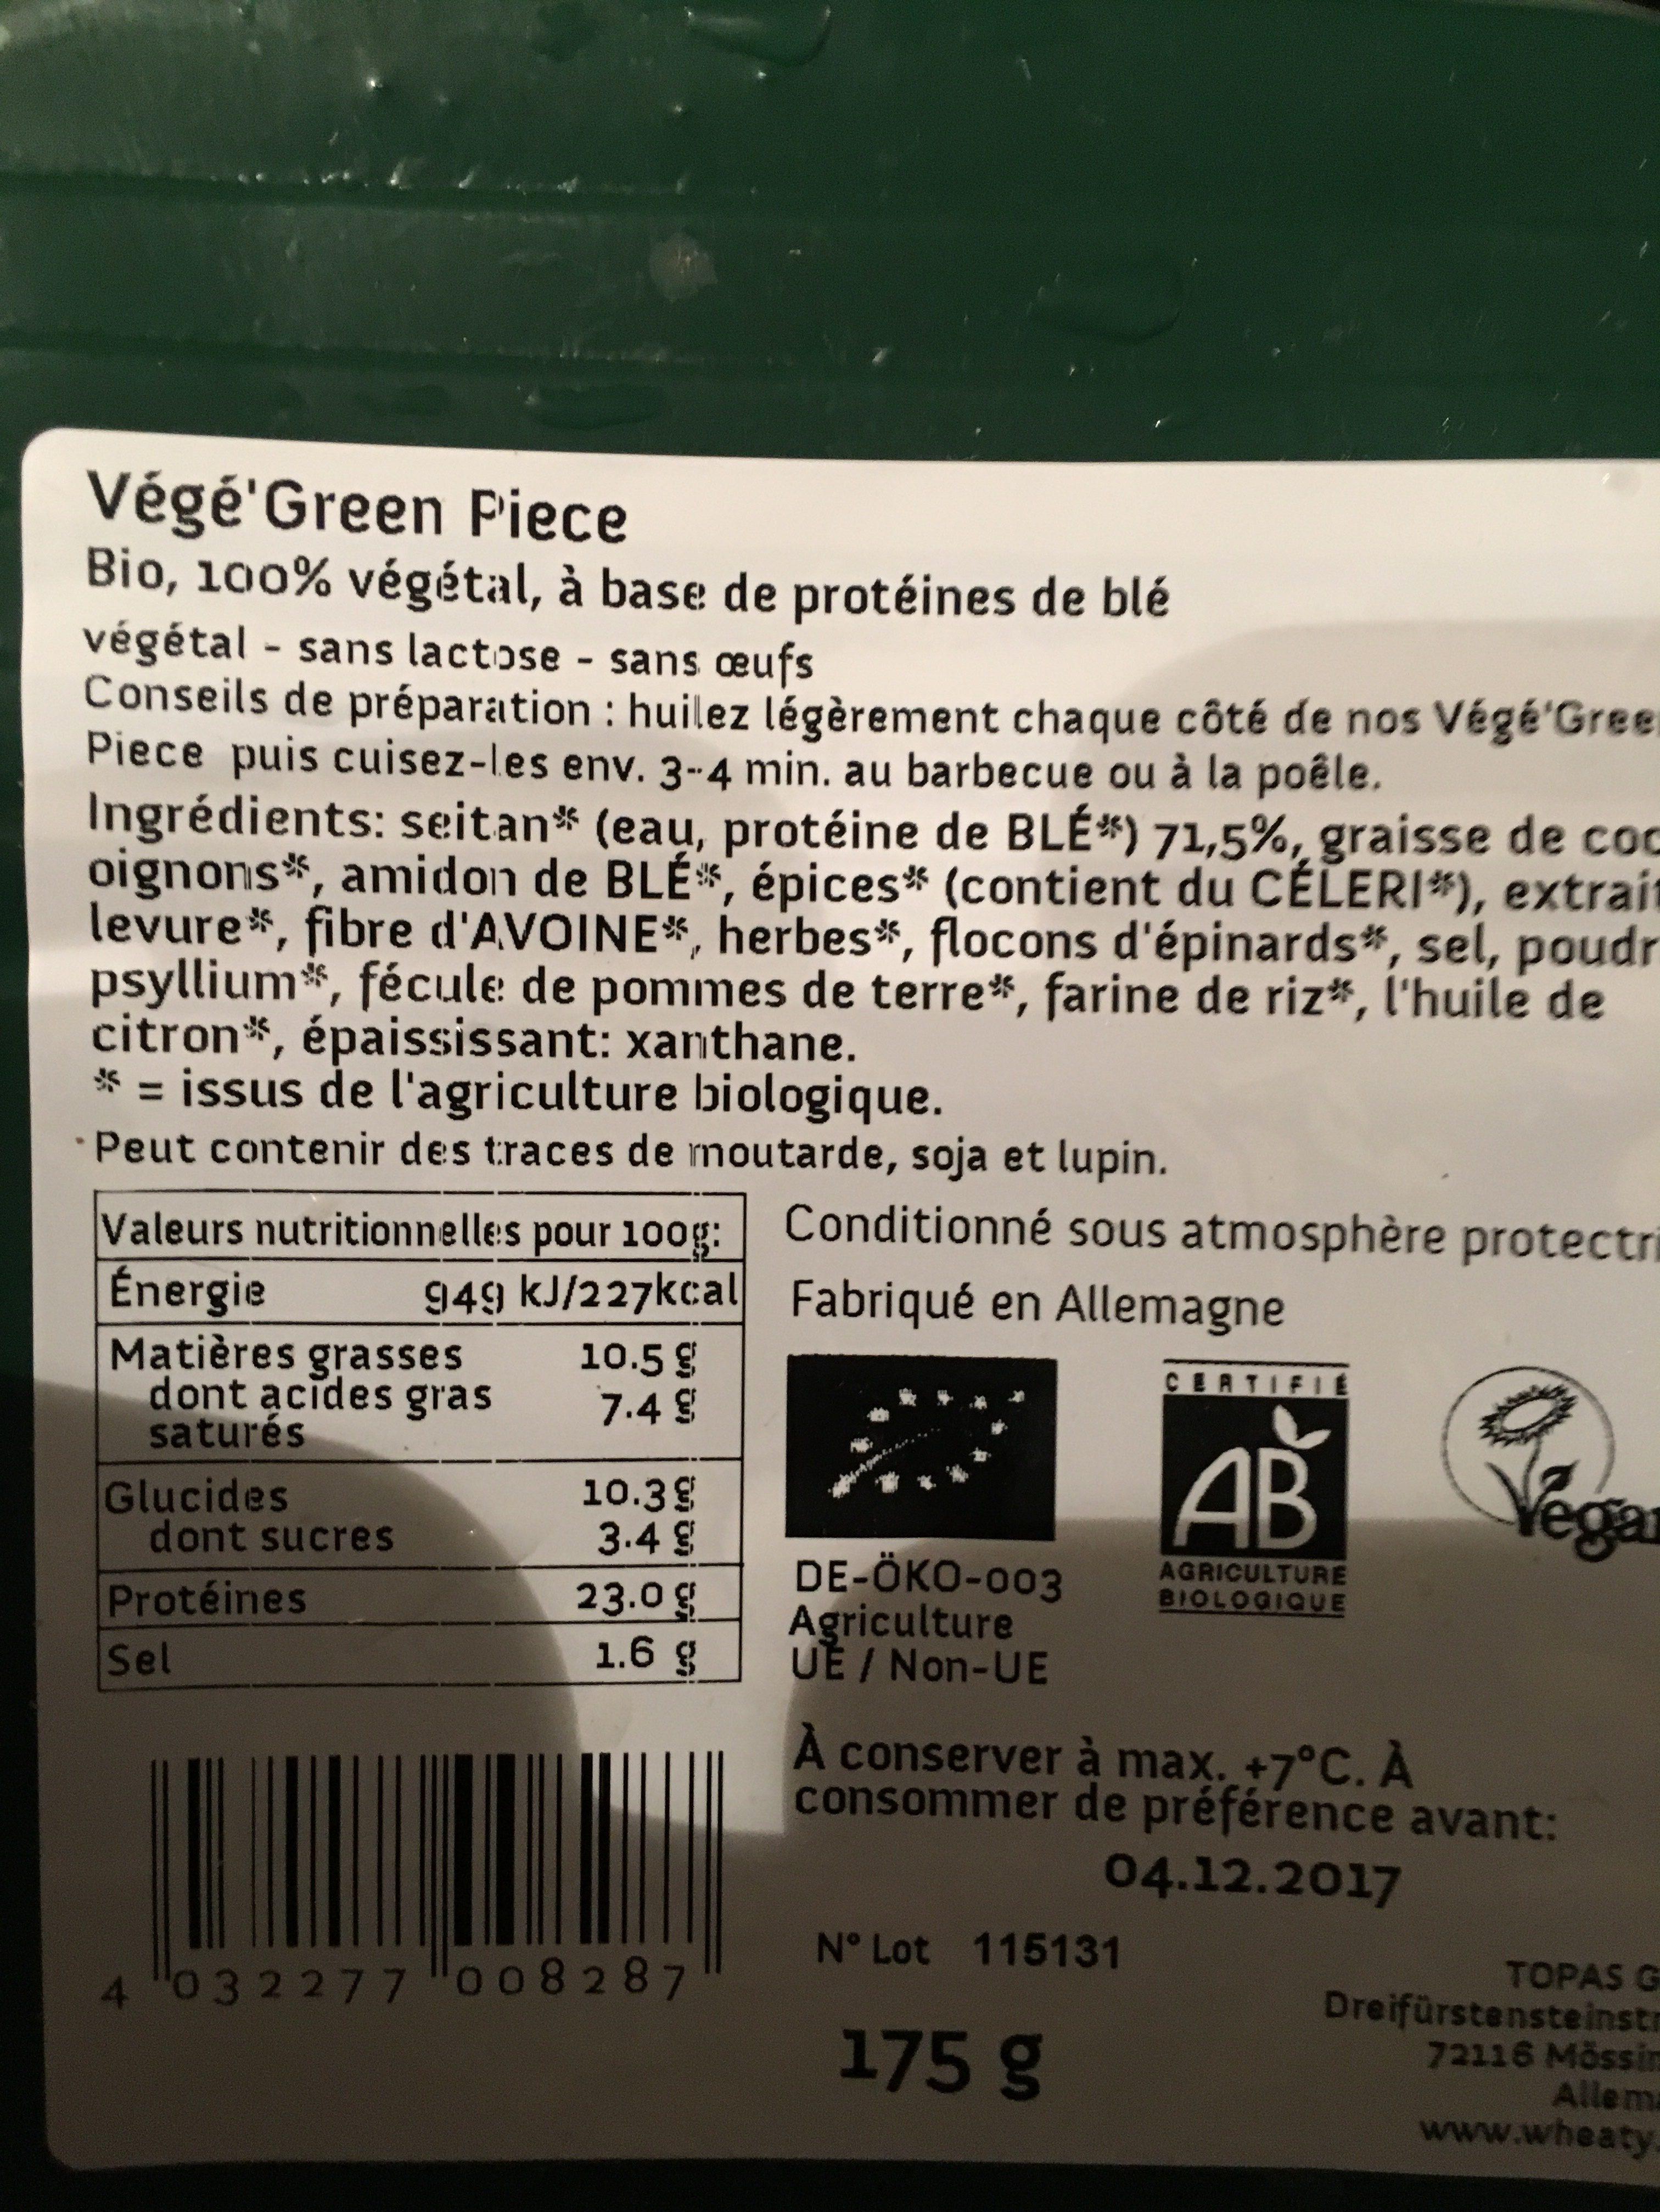 Veganbratstück Green Piece - Ingredients